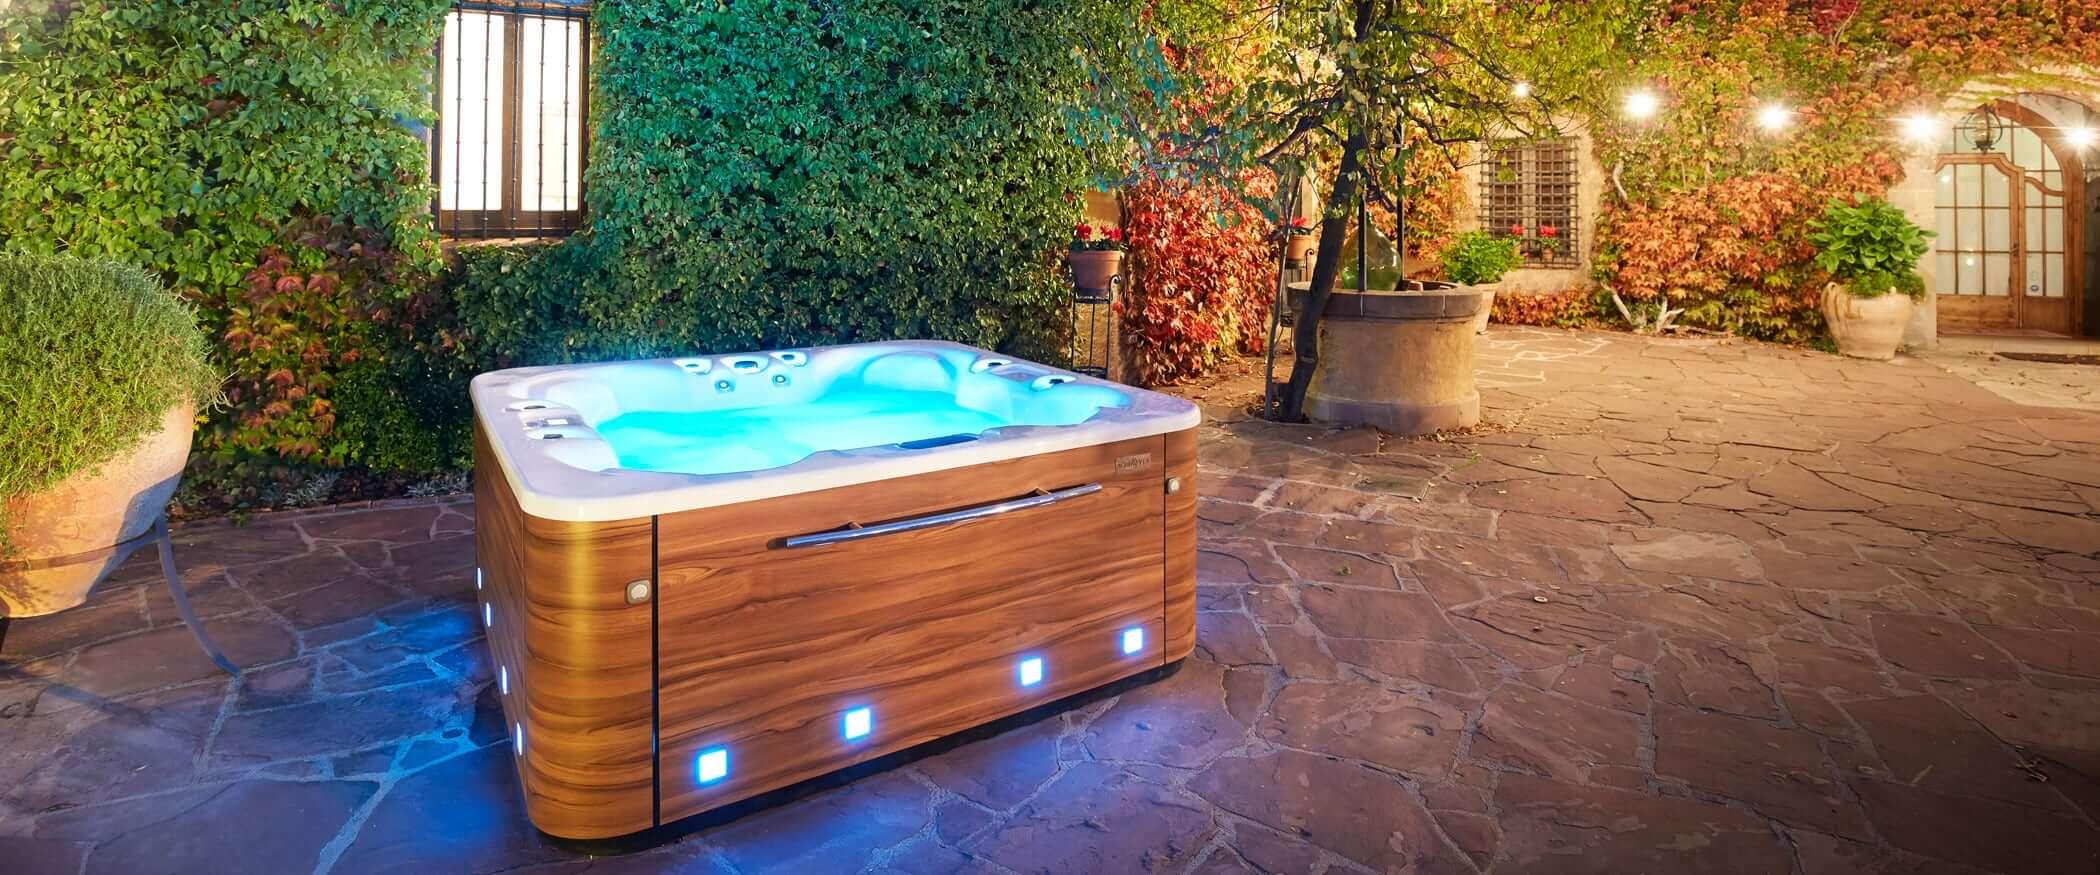 Buy the Premium hot tub Sunset - Aquavia Spa UK